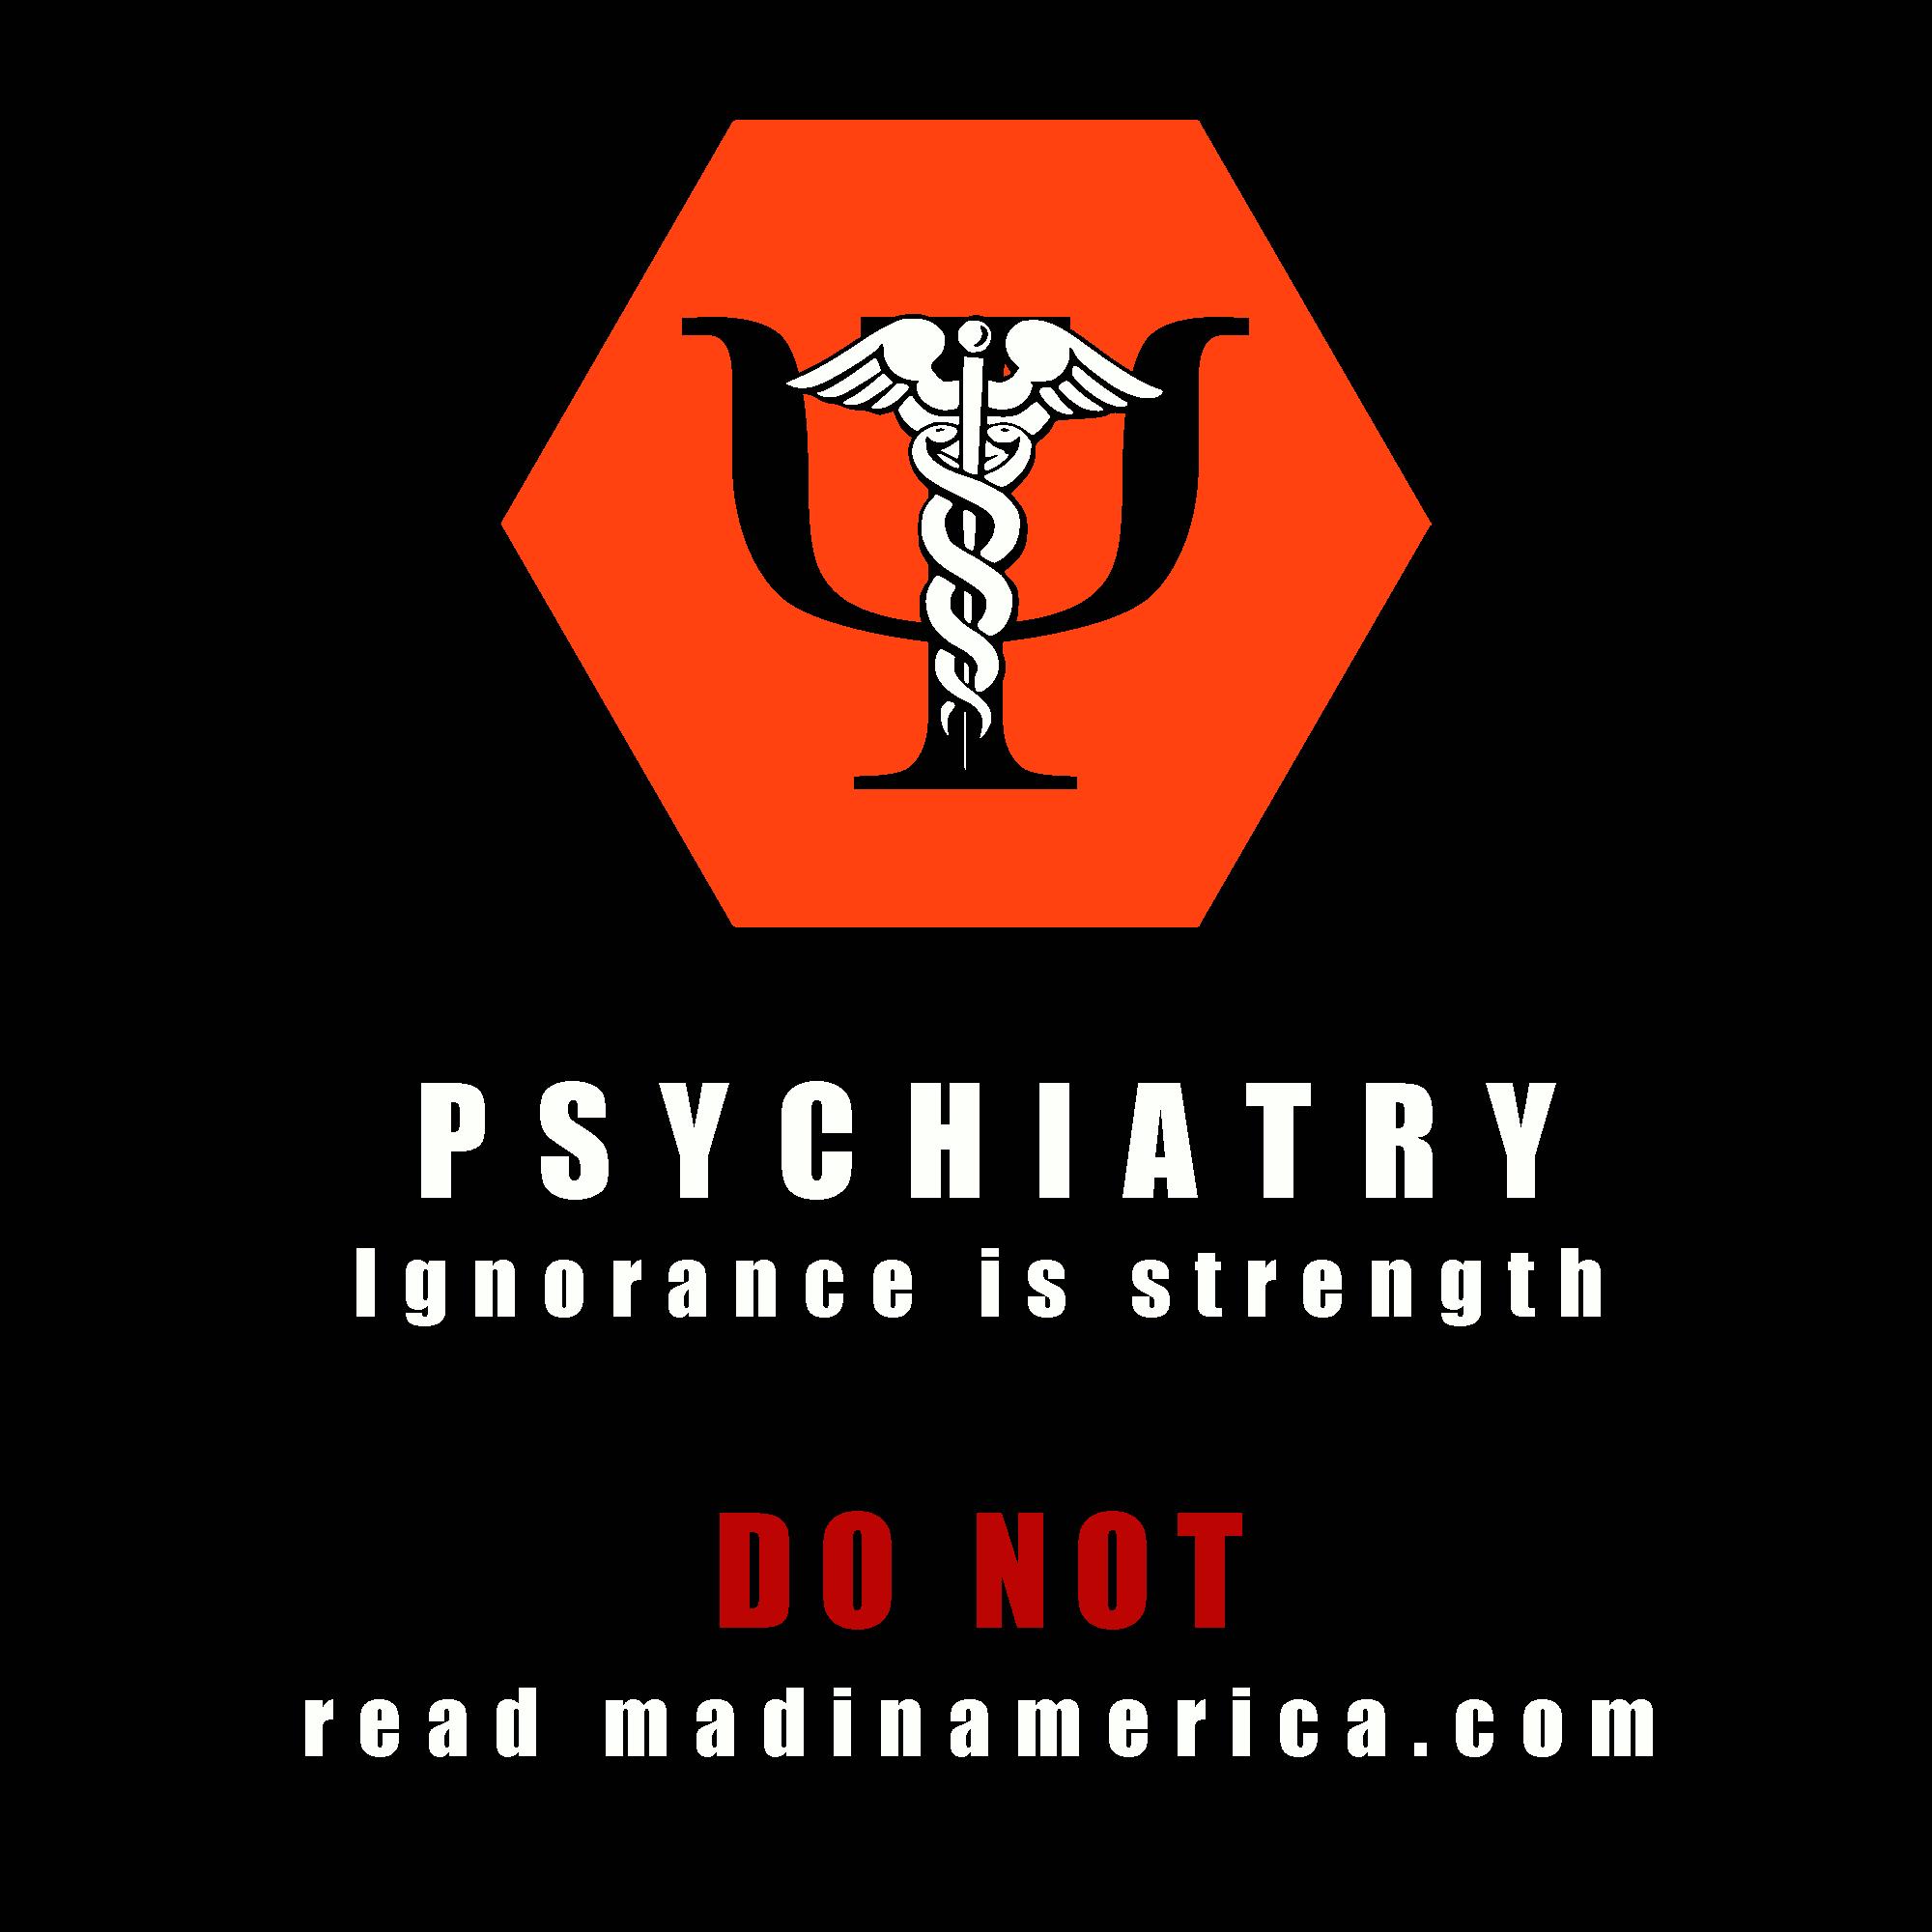 psychiatry DO NOT